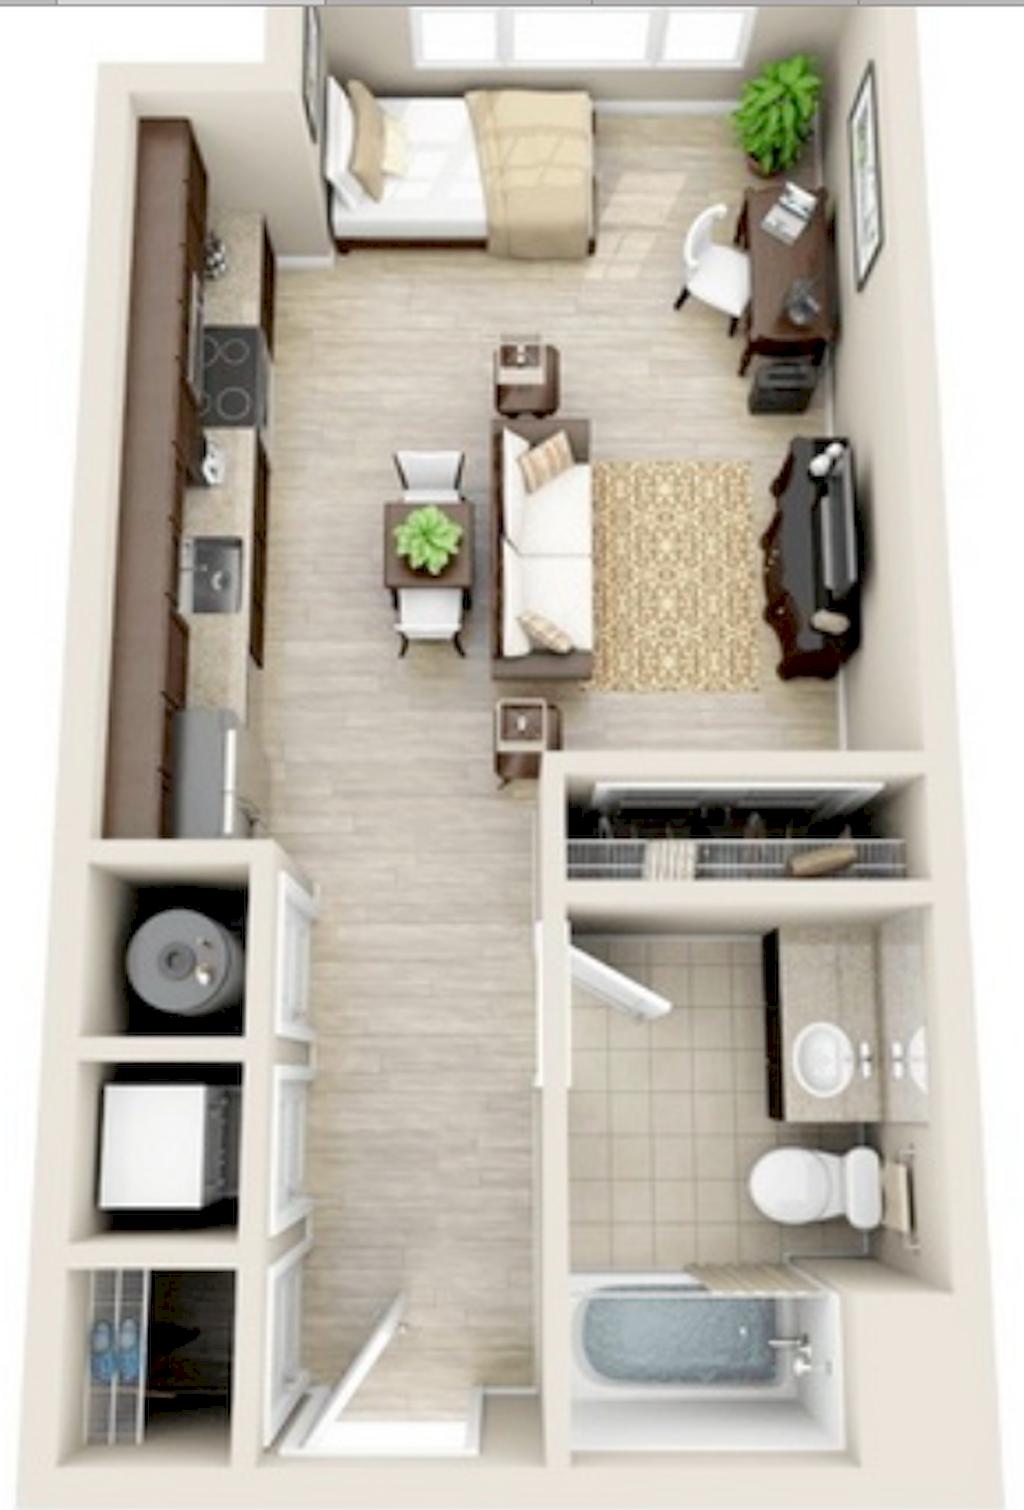 100+ Small Studio Apartment Layout Design Ideas - home ...